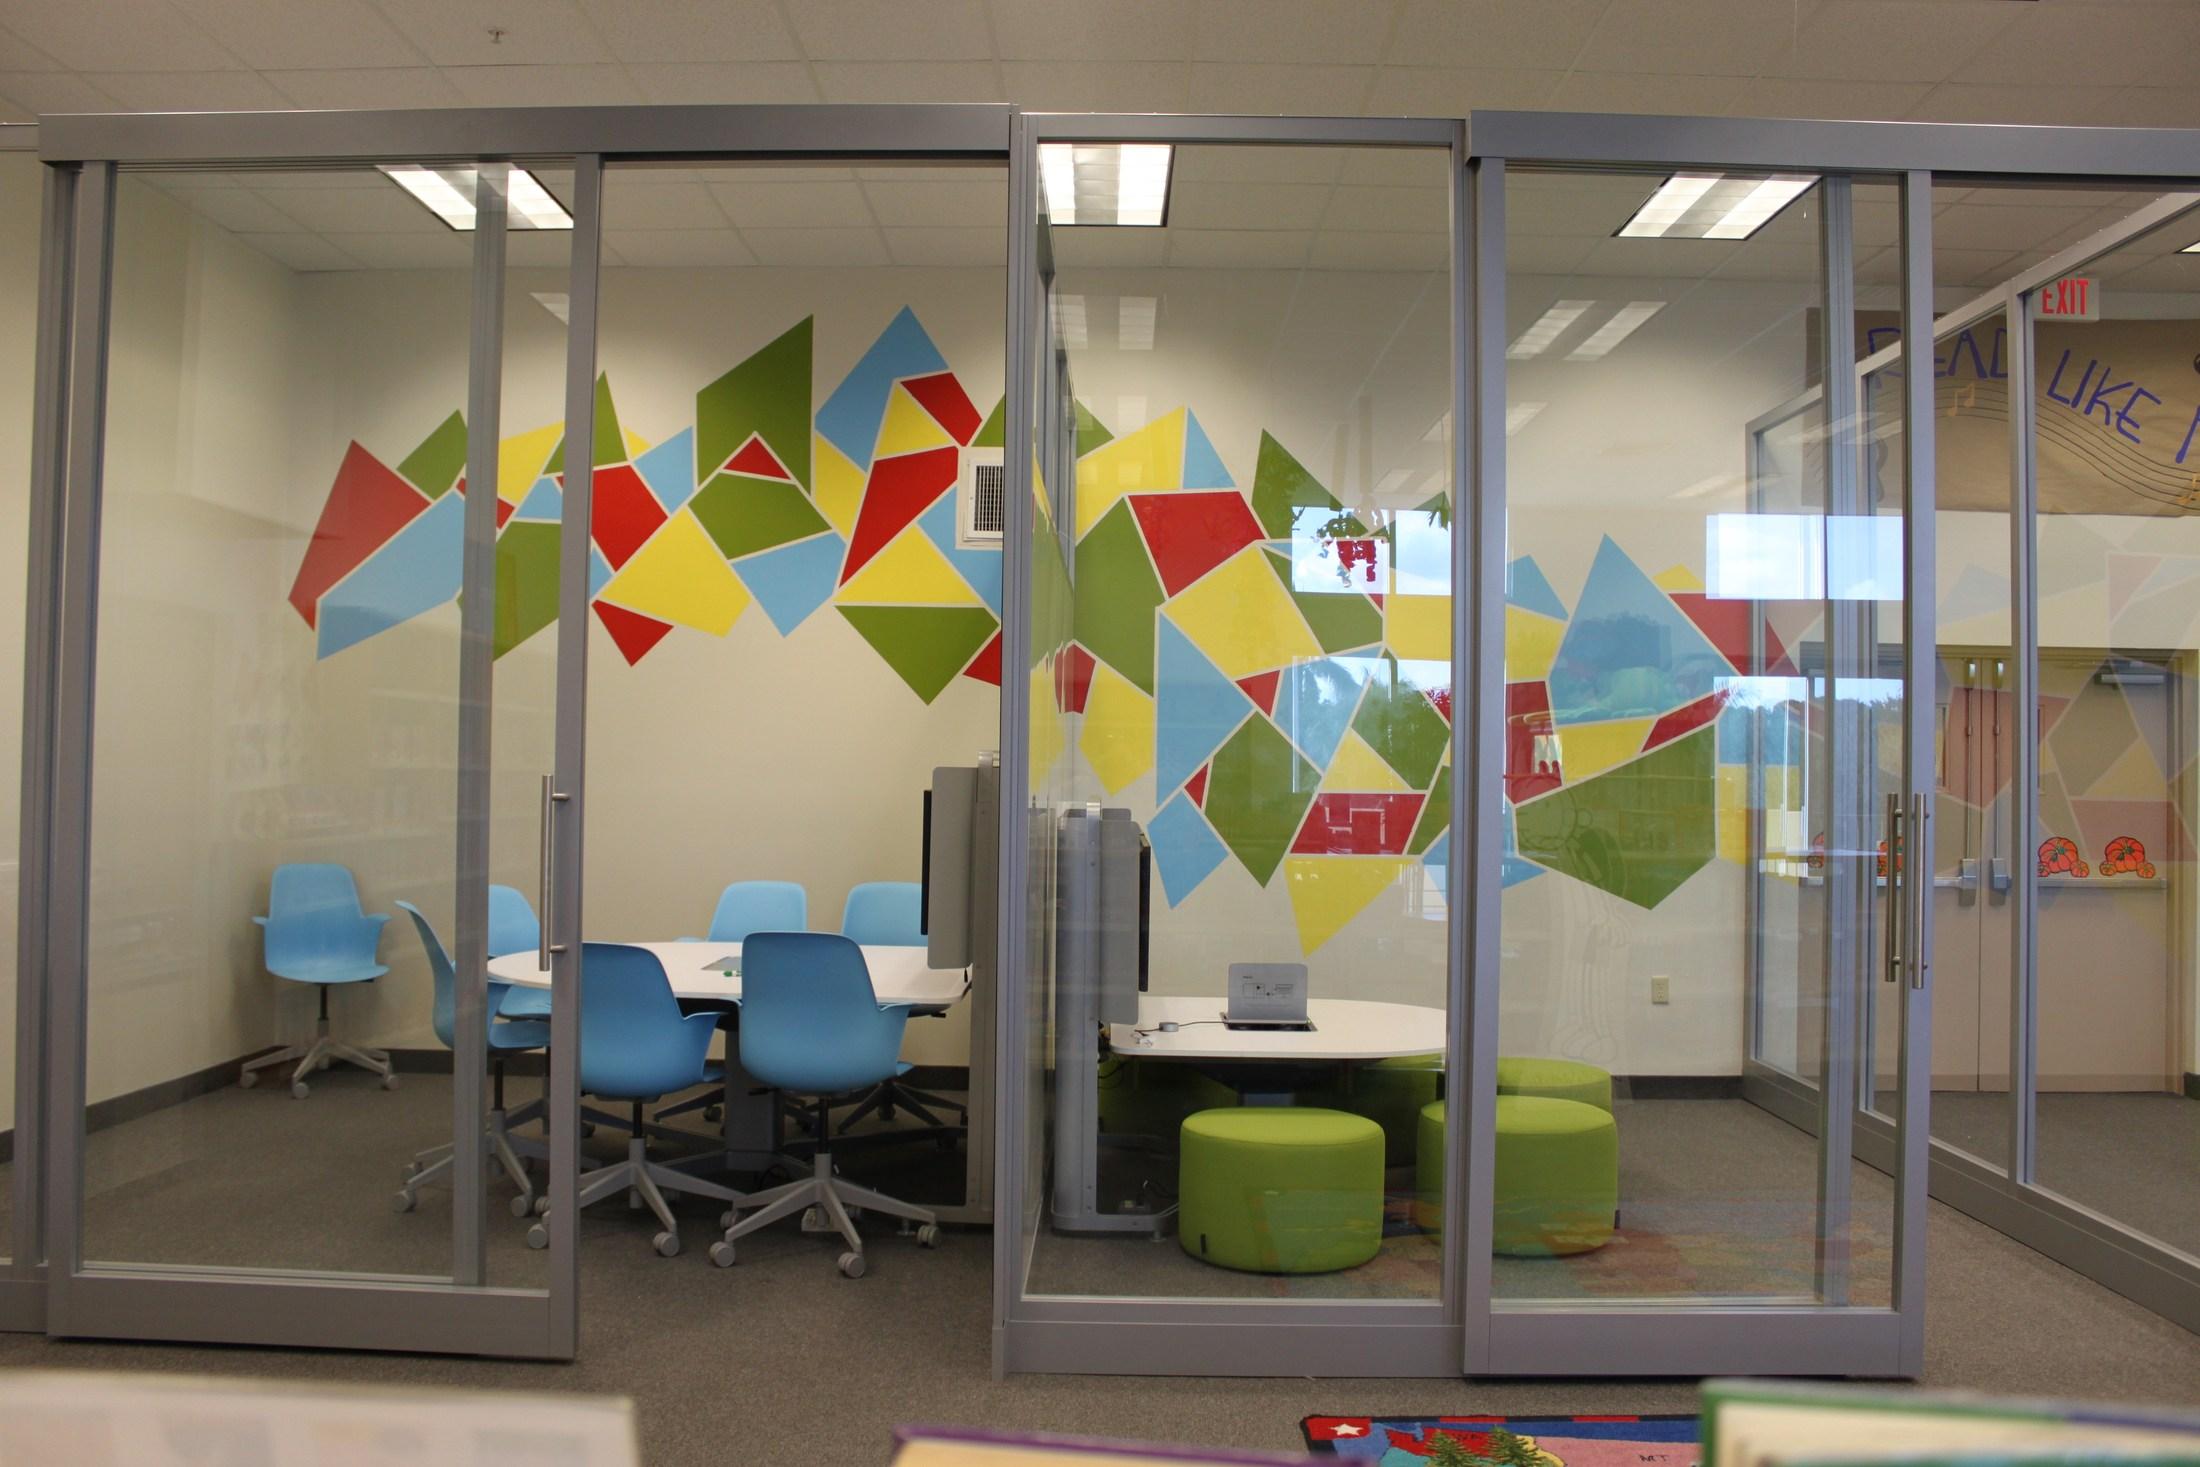 Creative School Nurse Office Ideas  School Nurse  Pinterest  Ideas School